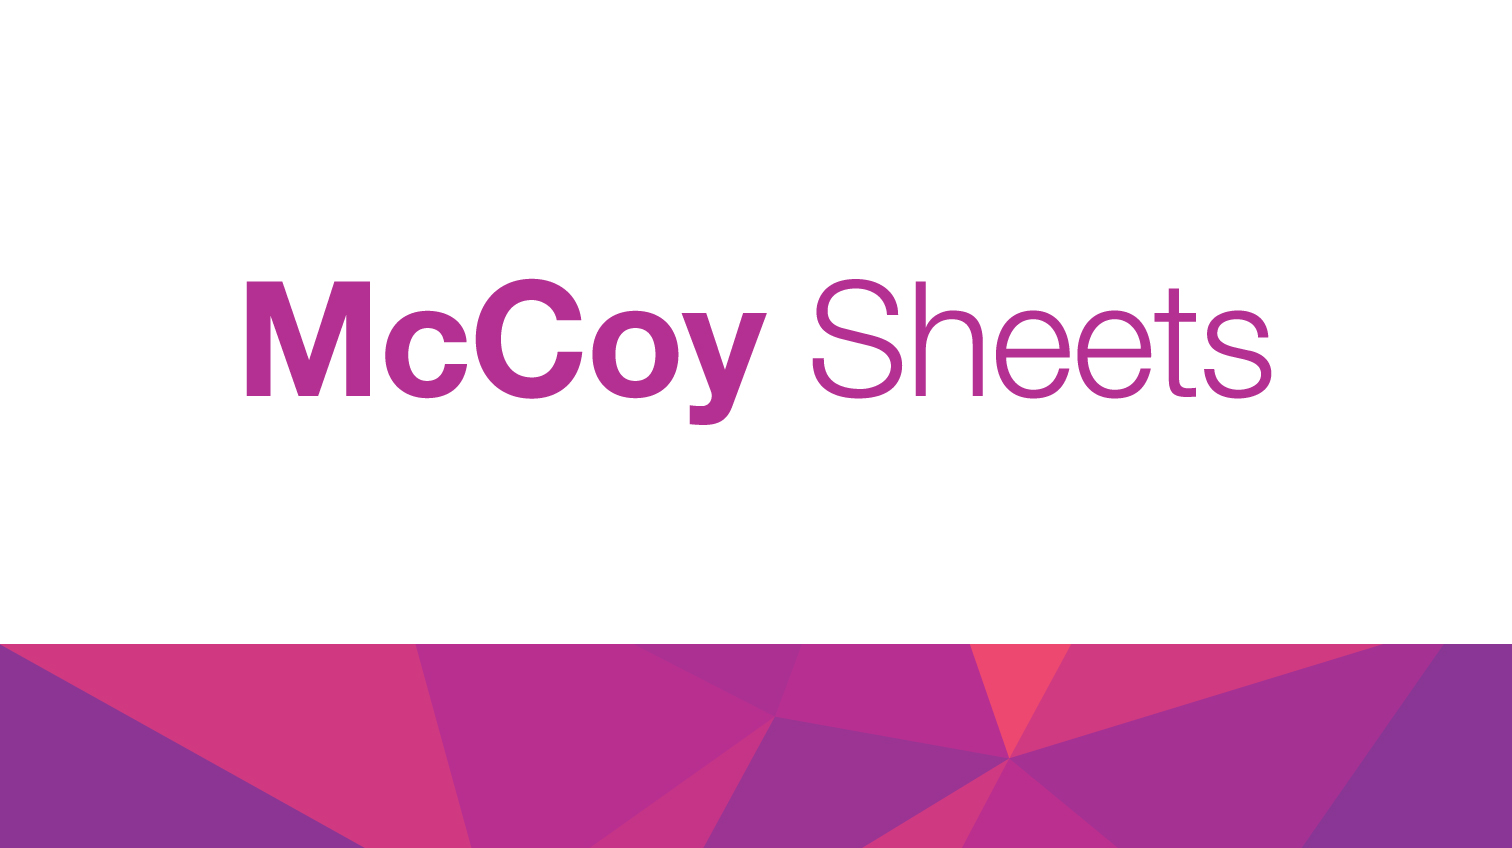 McCoy Sheets | Sappi Global